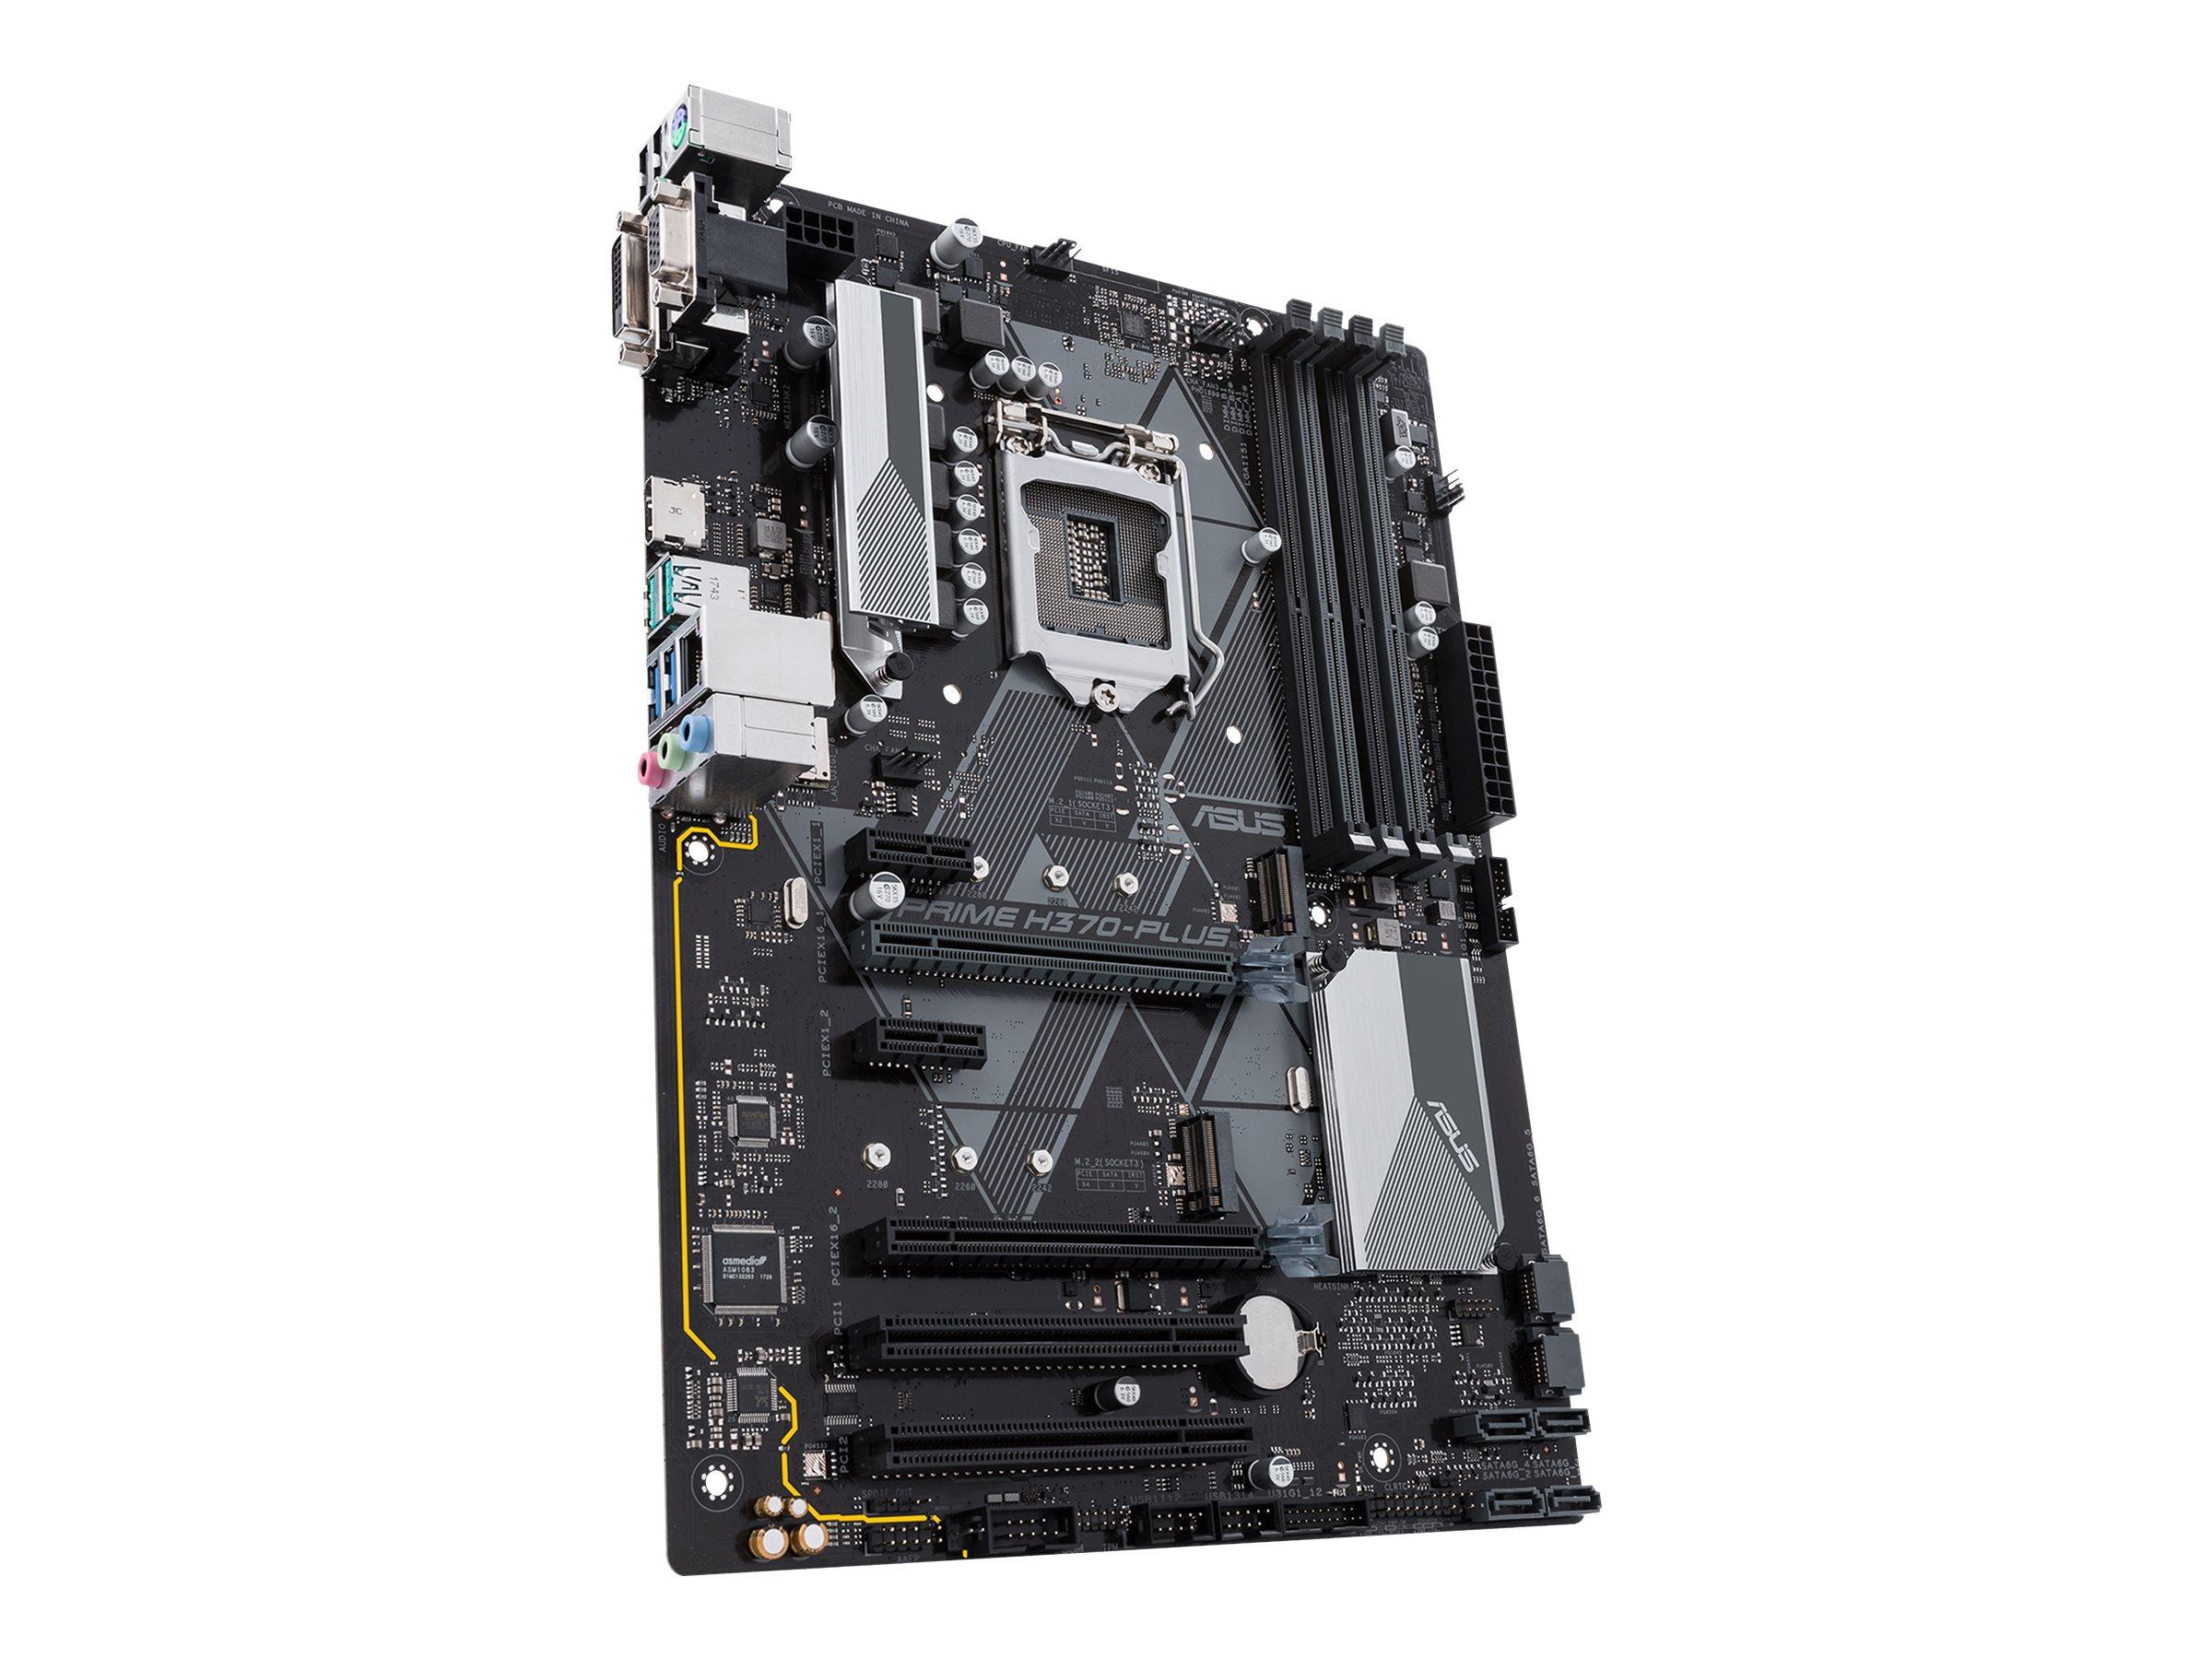 ASUS PRIME H370-PLUS - Motherboard - ATX - LGA1151 Socket - H370 - USB 3.1 Gen 1, USB 3.1 Gen 2